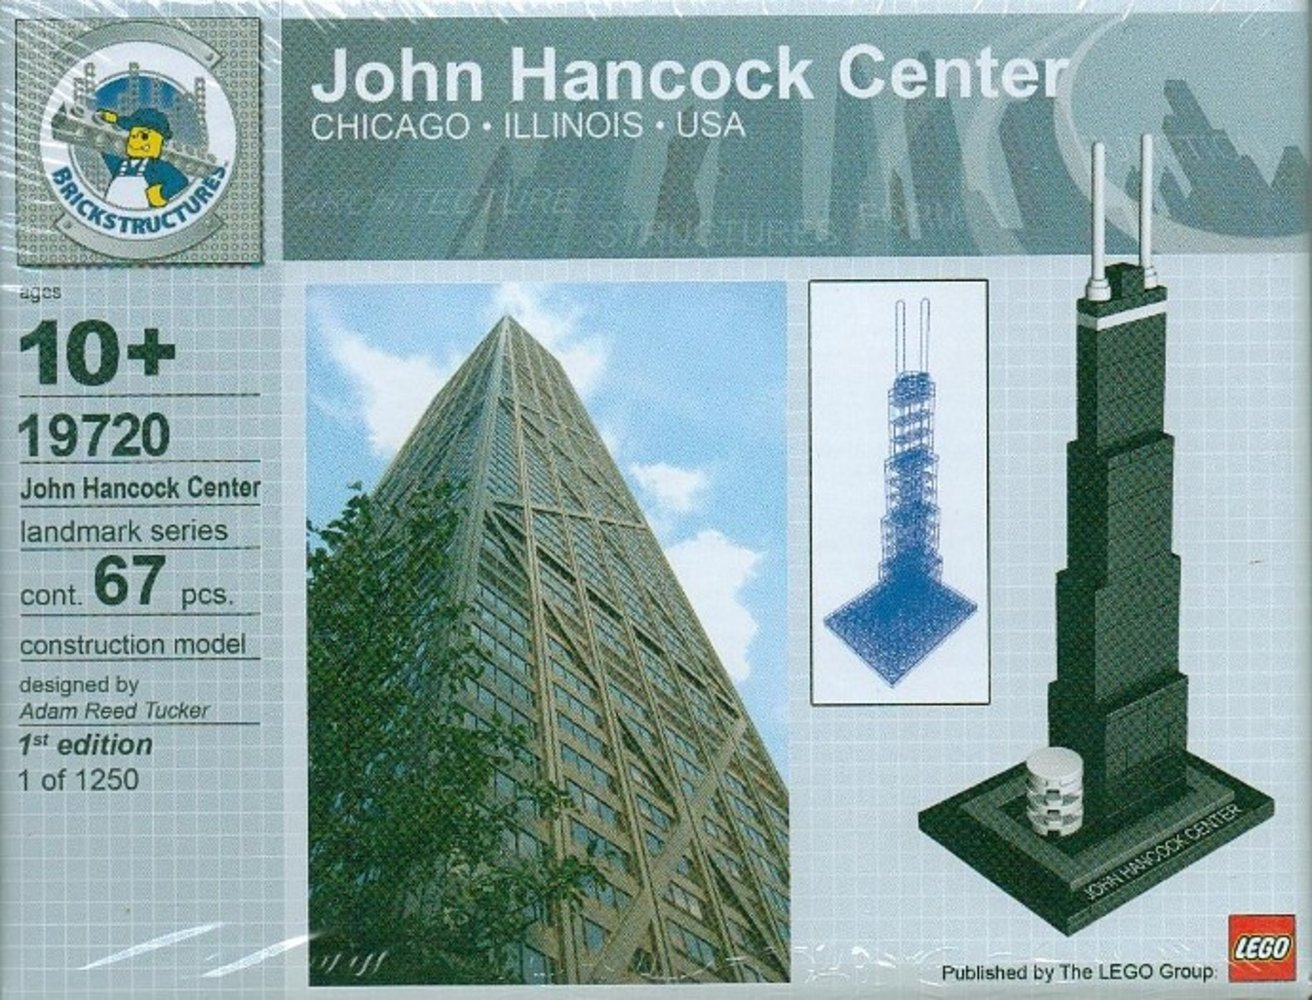 John Hancock Center (Brickstructures Version)